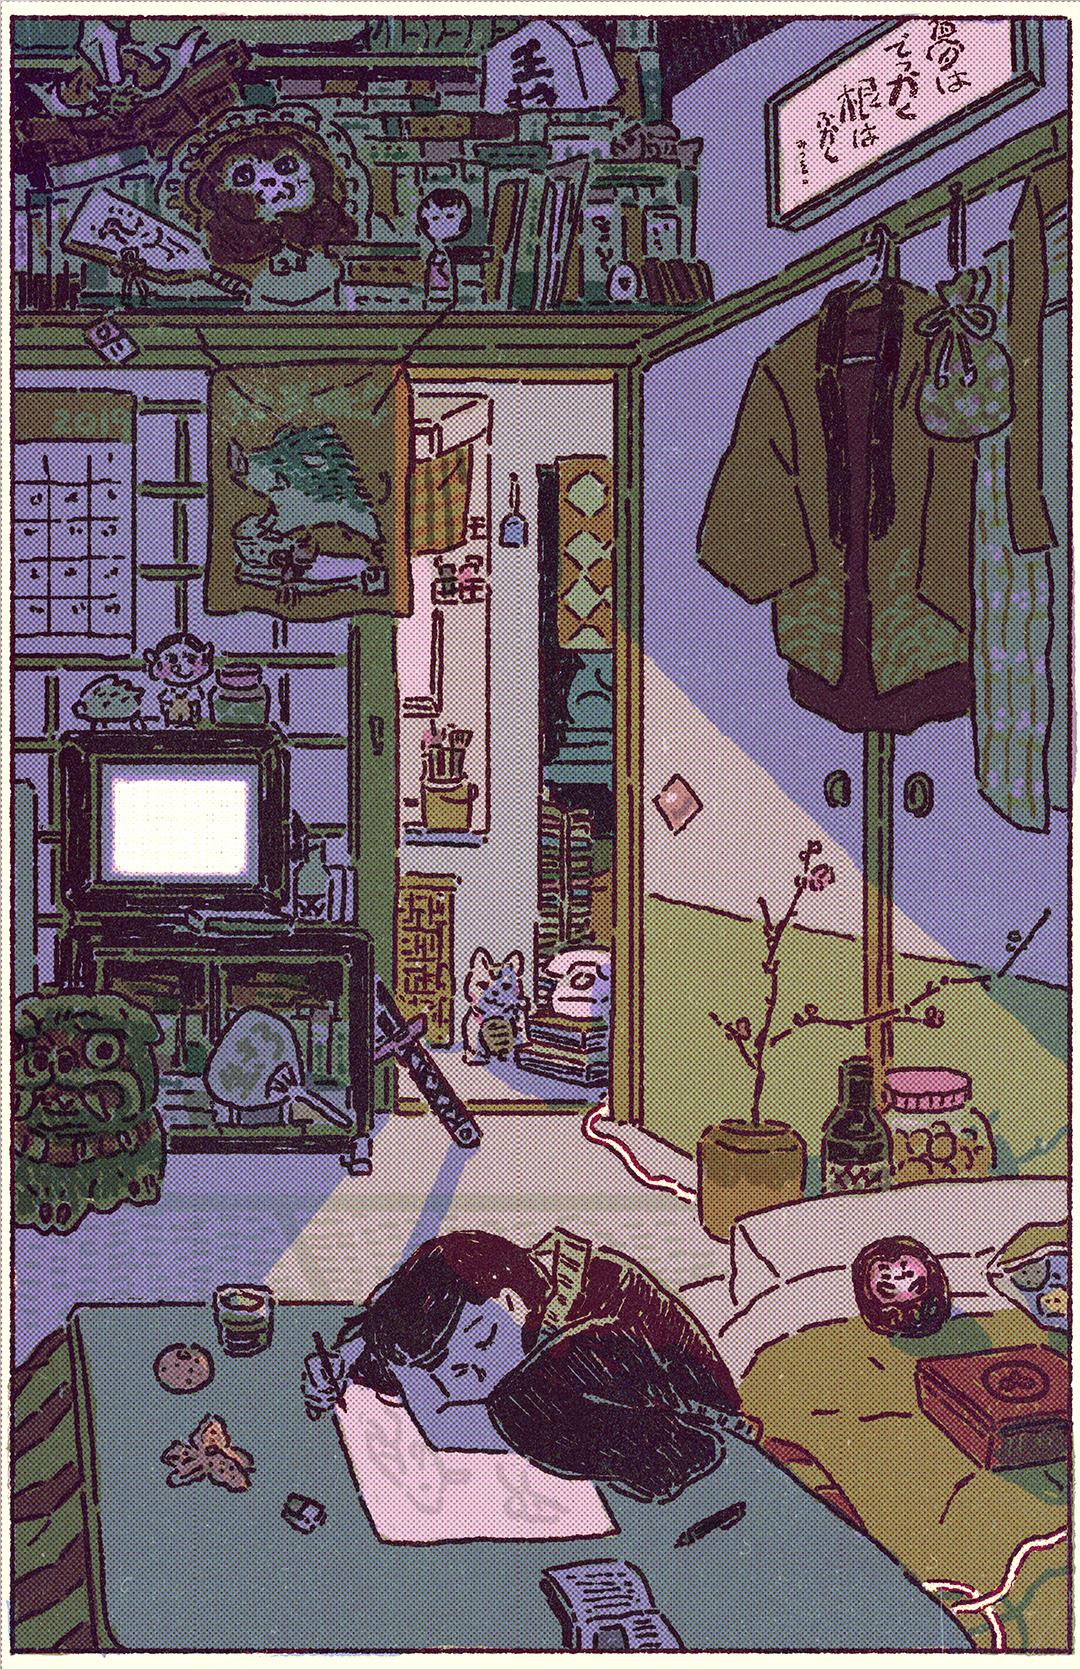 GirlsclubAsia-Illustrator-Dozingoff_Lisa Kogawa